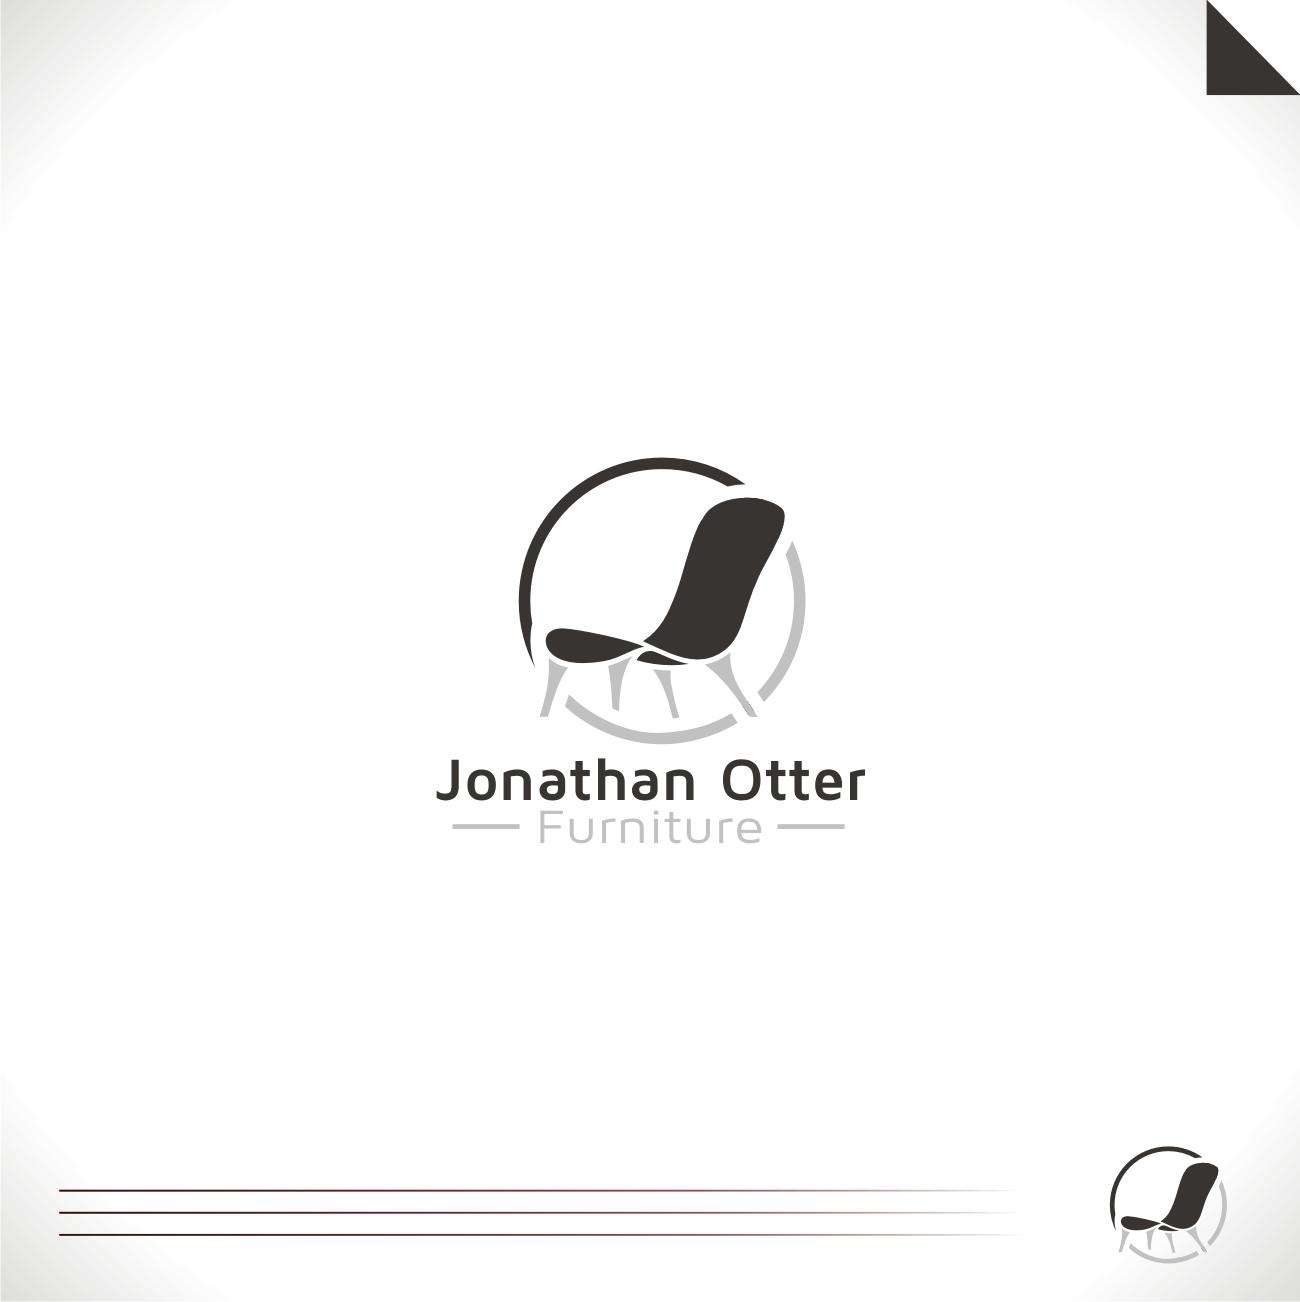 Serious Modern Furniture Logo Design for Jonathan Otter Furniture